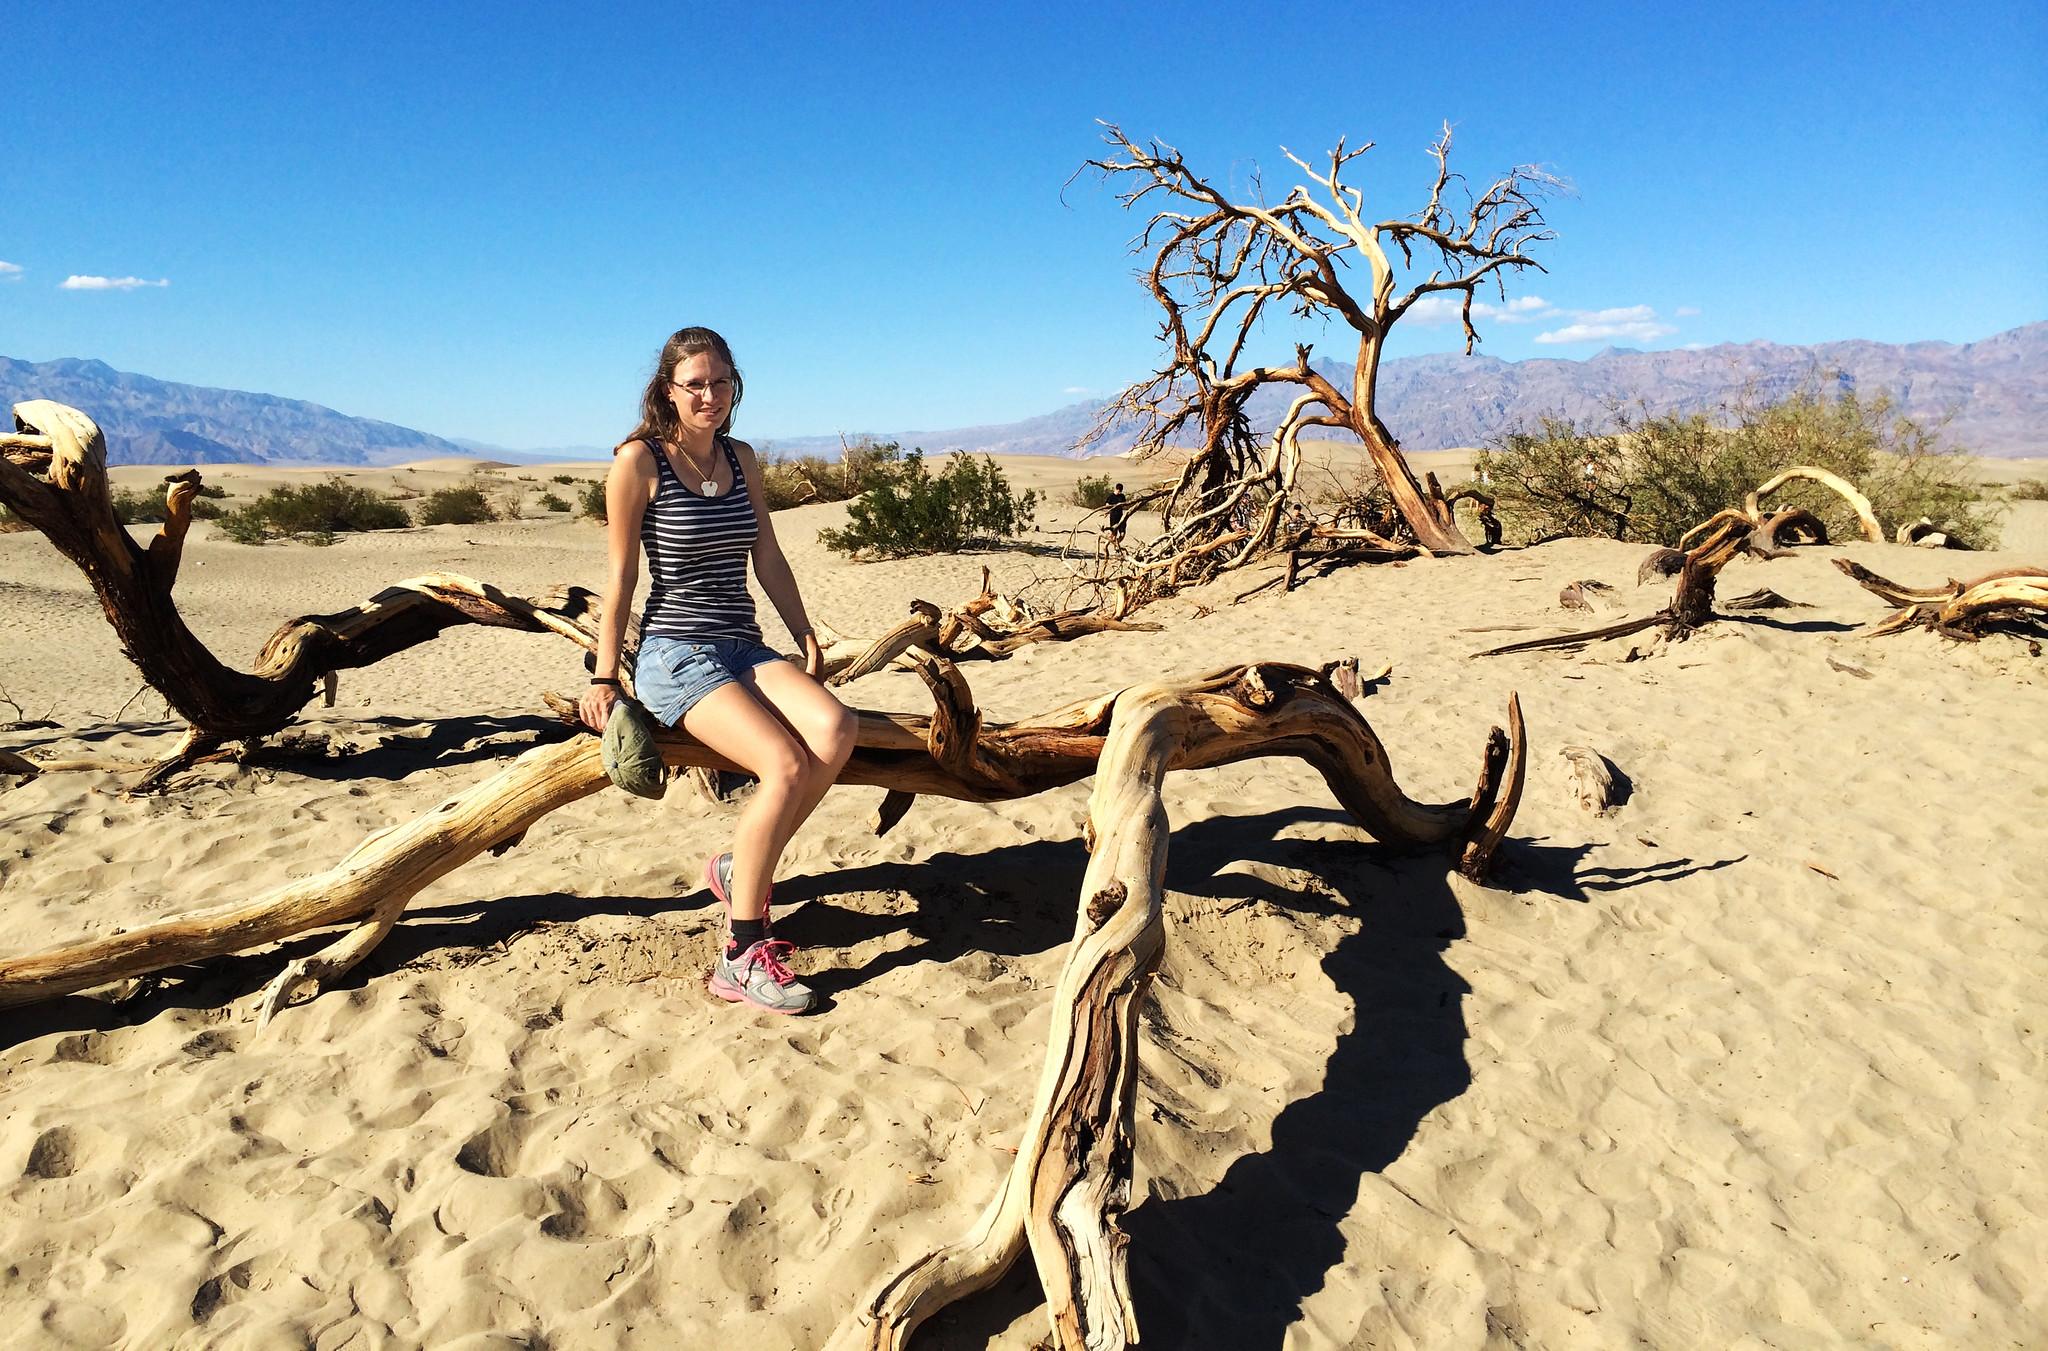 Mesquite Flat Dunes, Death Valley National Park, CA, USA